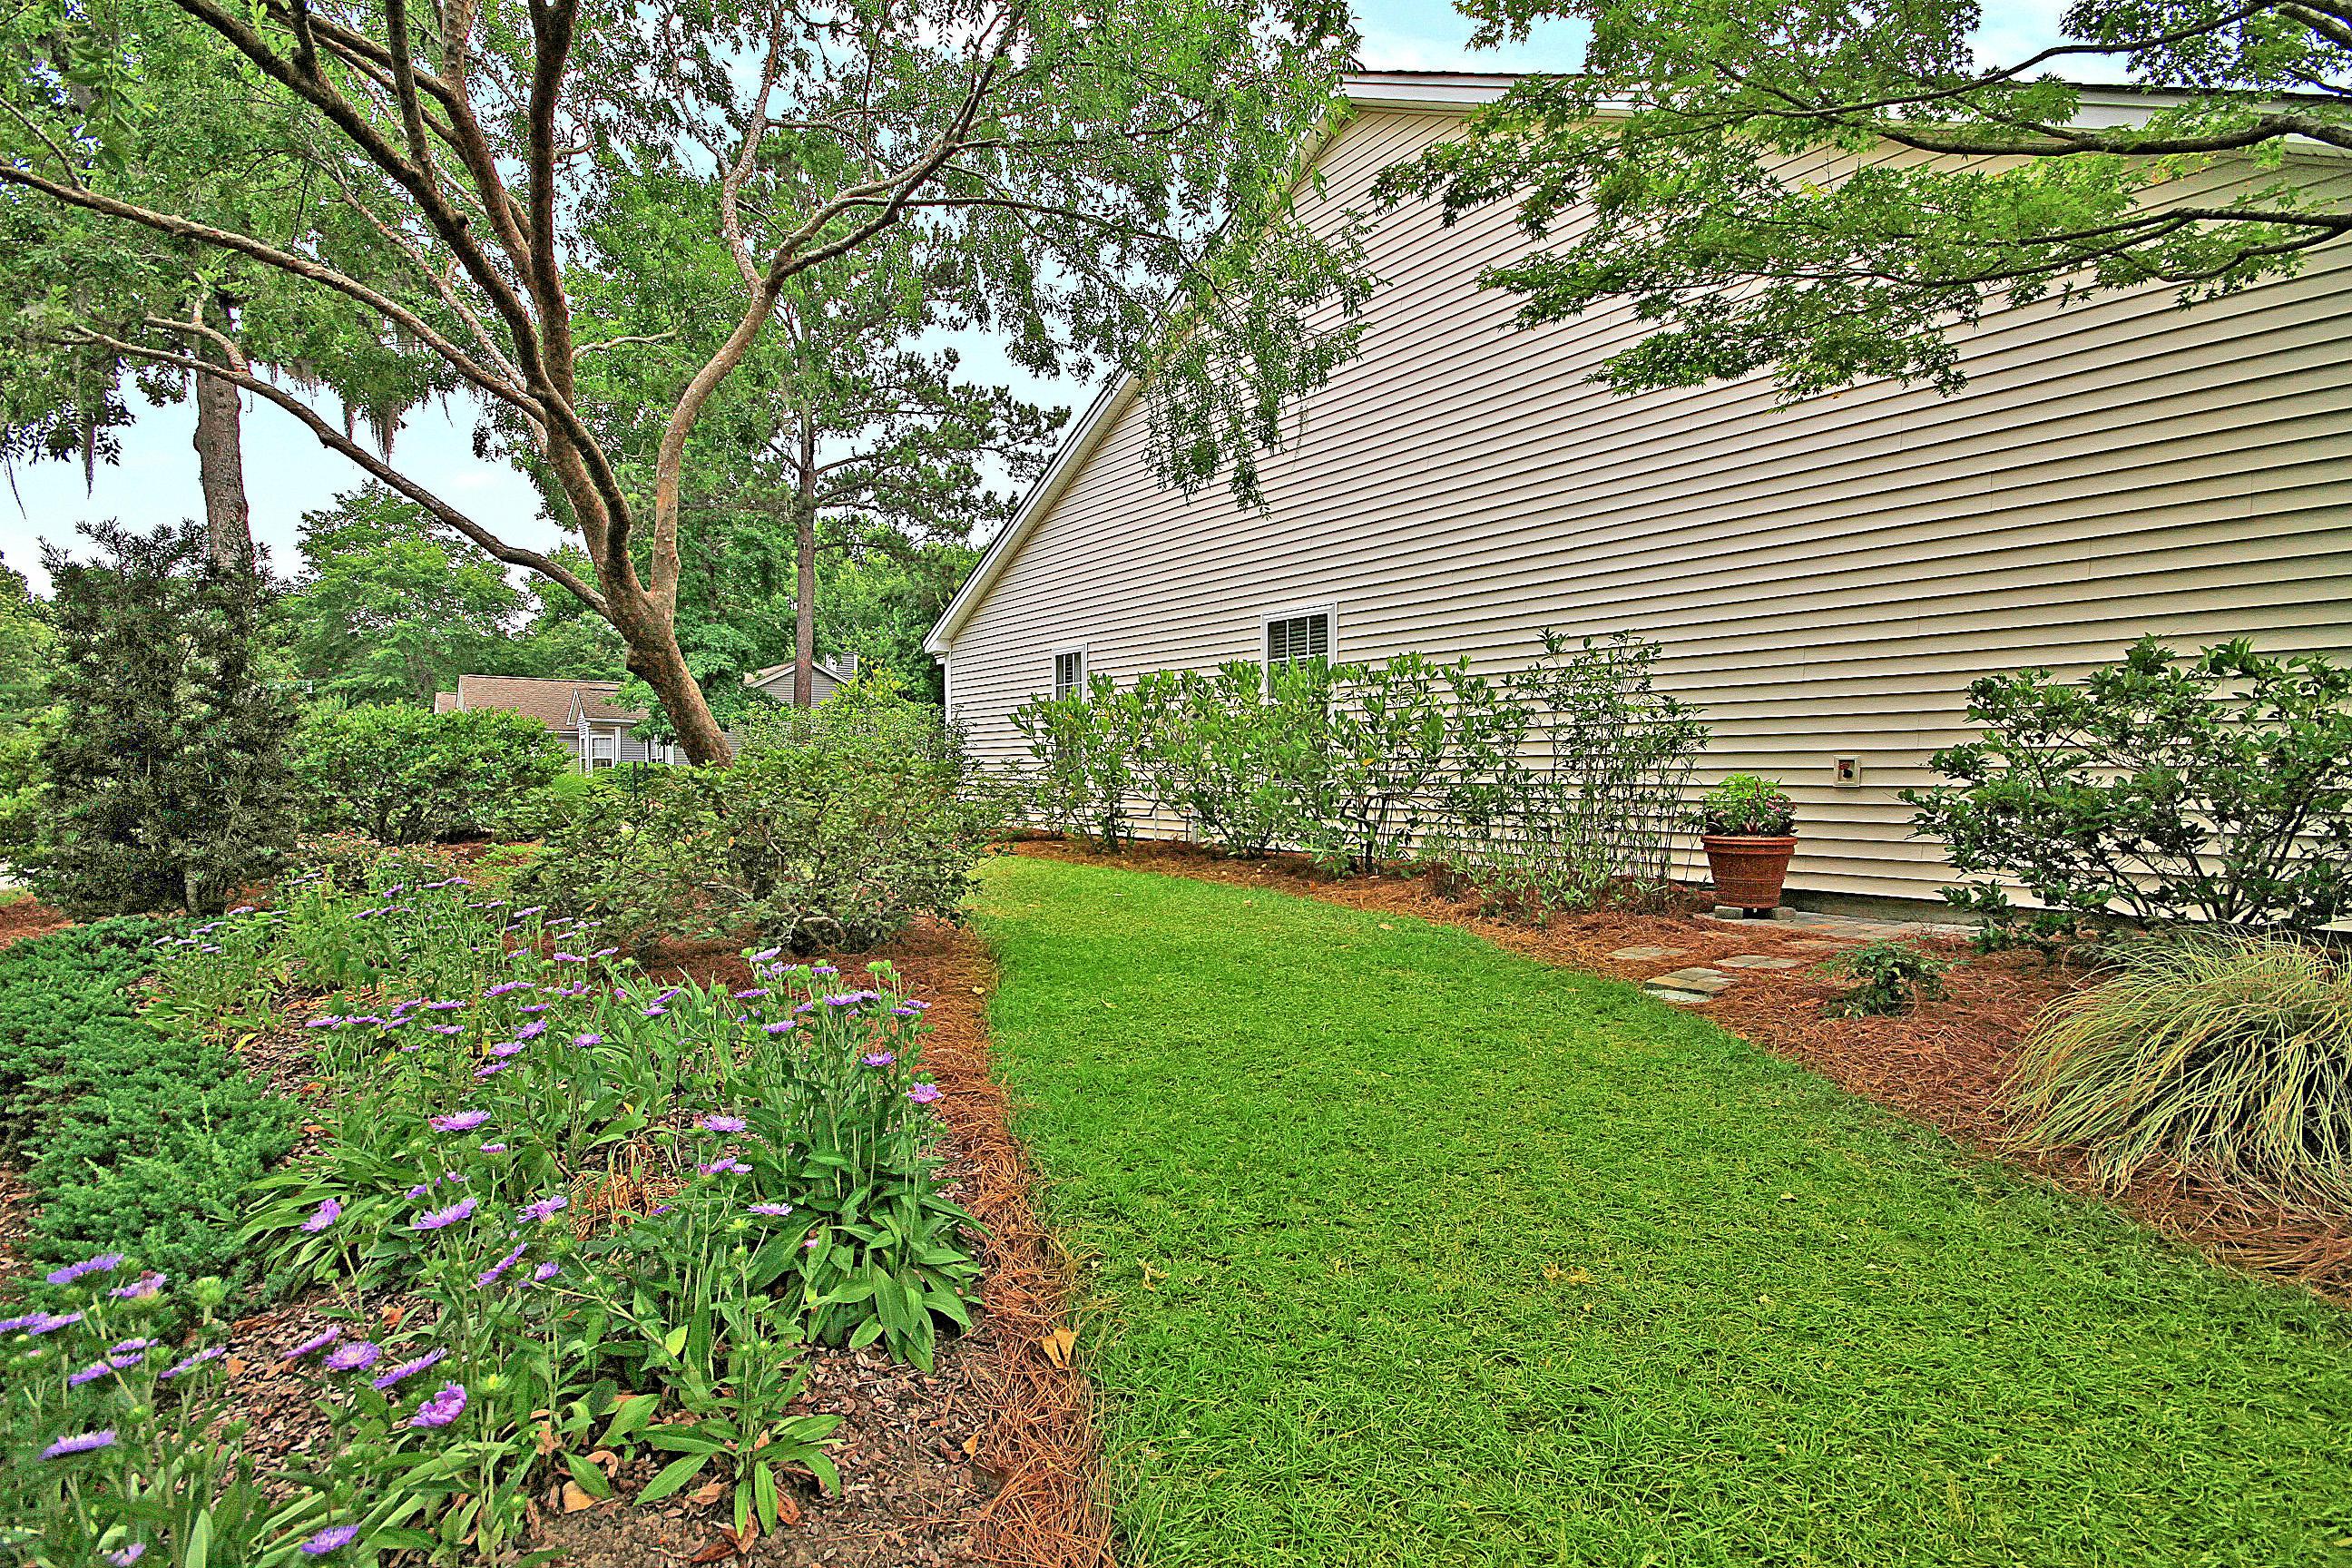 Planters Pointe Homes For Sale - 2863 Curran, Mount Pleasant, SC - 15